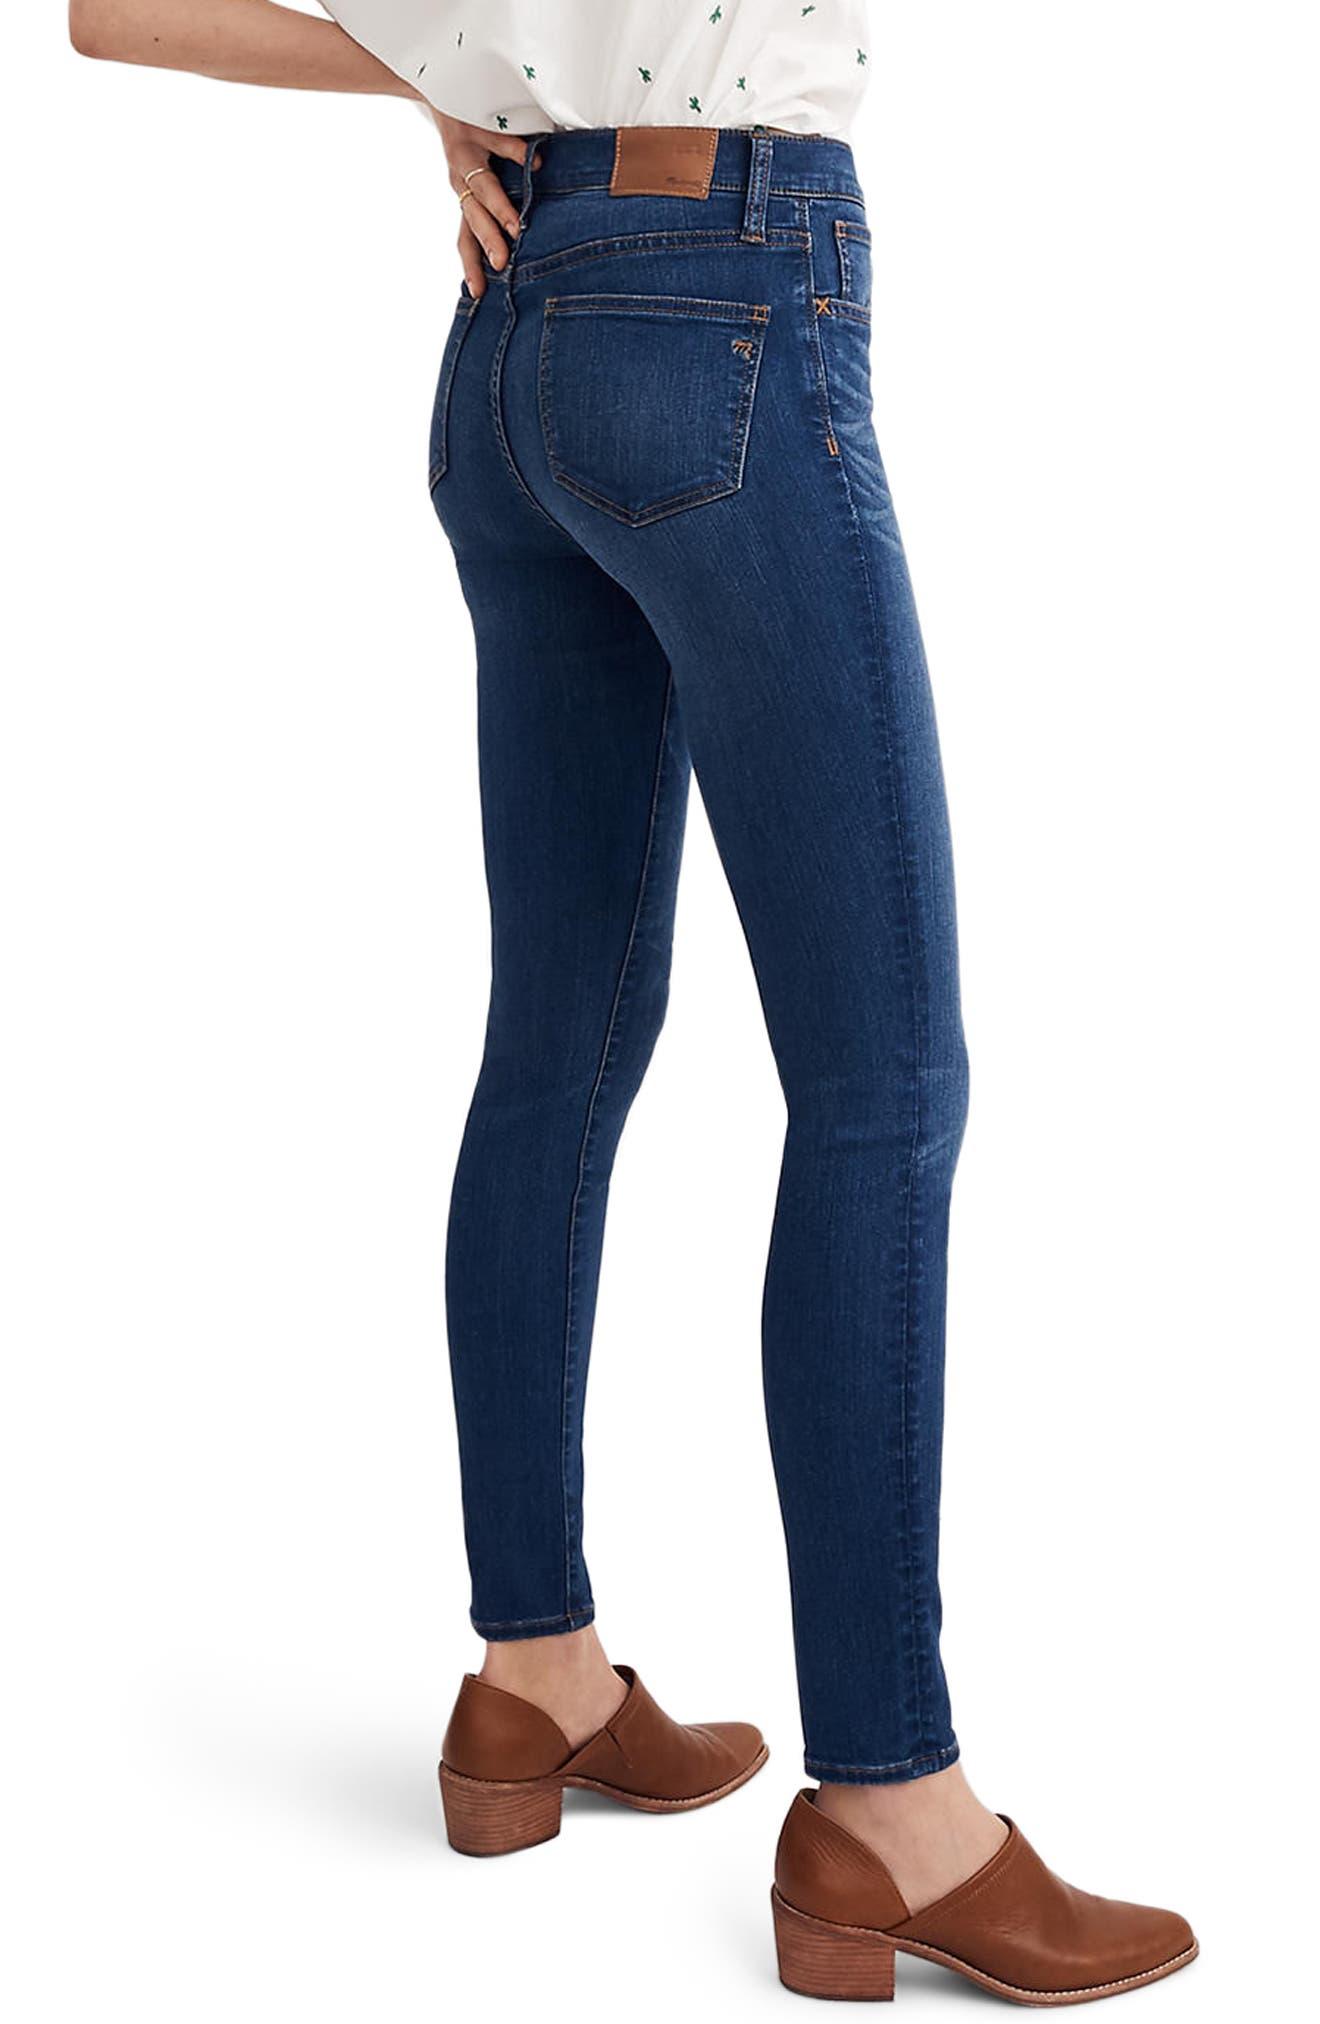 Roadtripper High Waist Skinny Jeans,                             Alternate thumbnail 2, color,                             Orson Wash